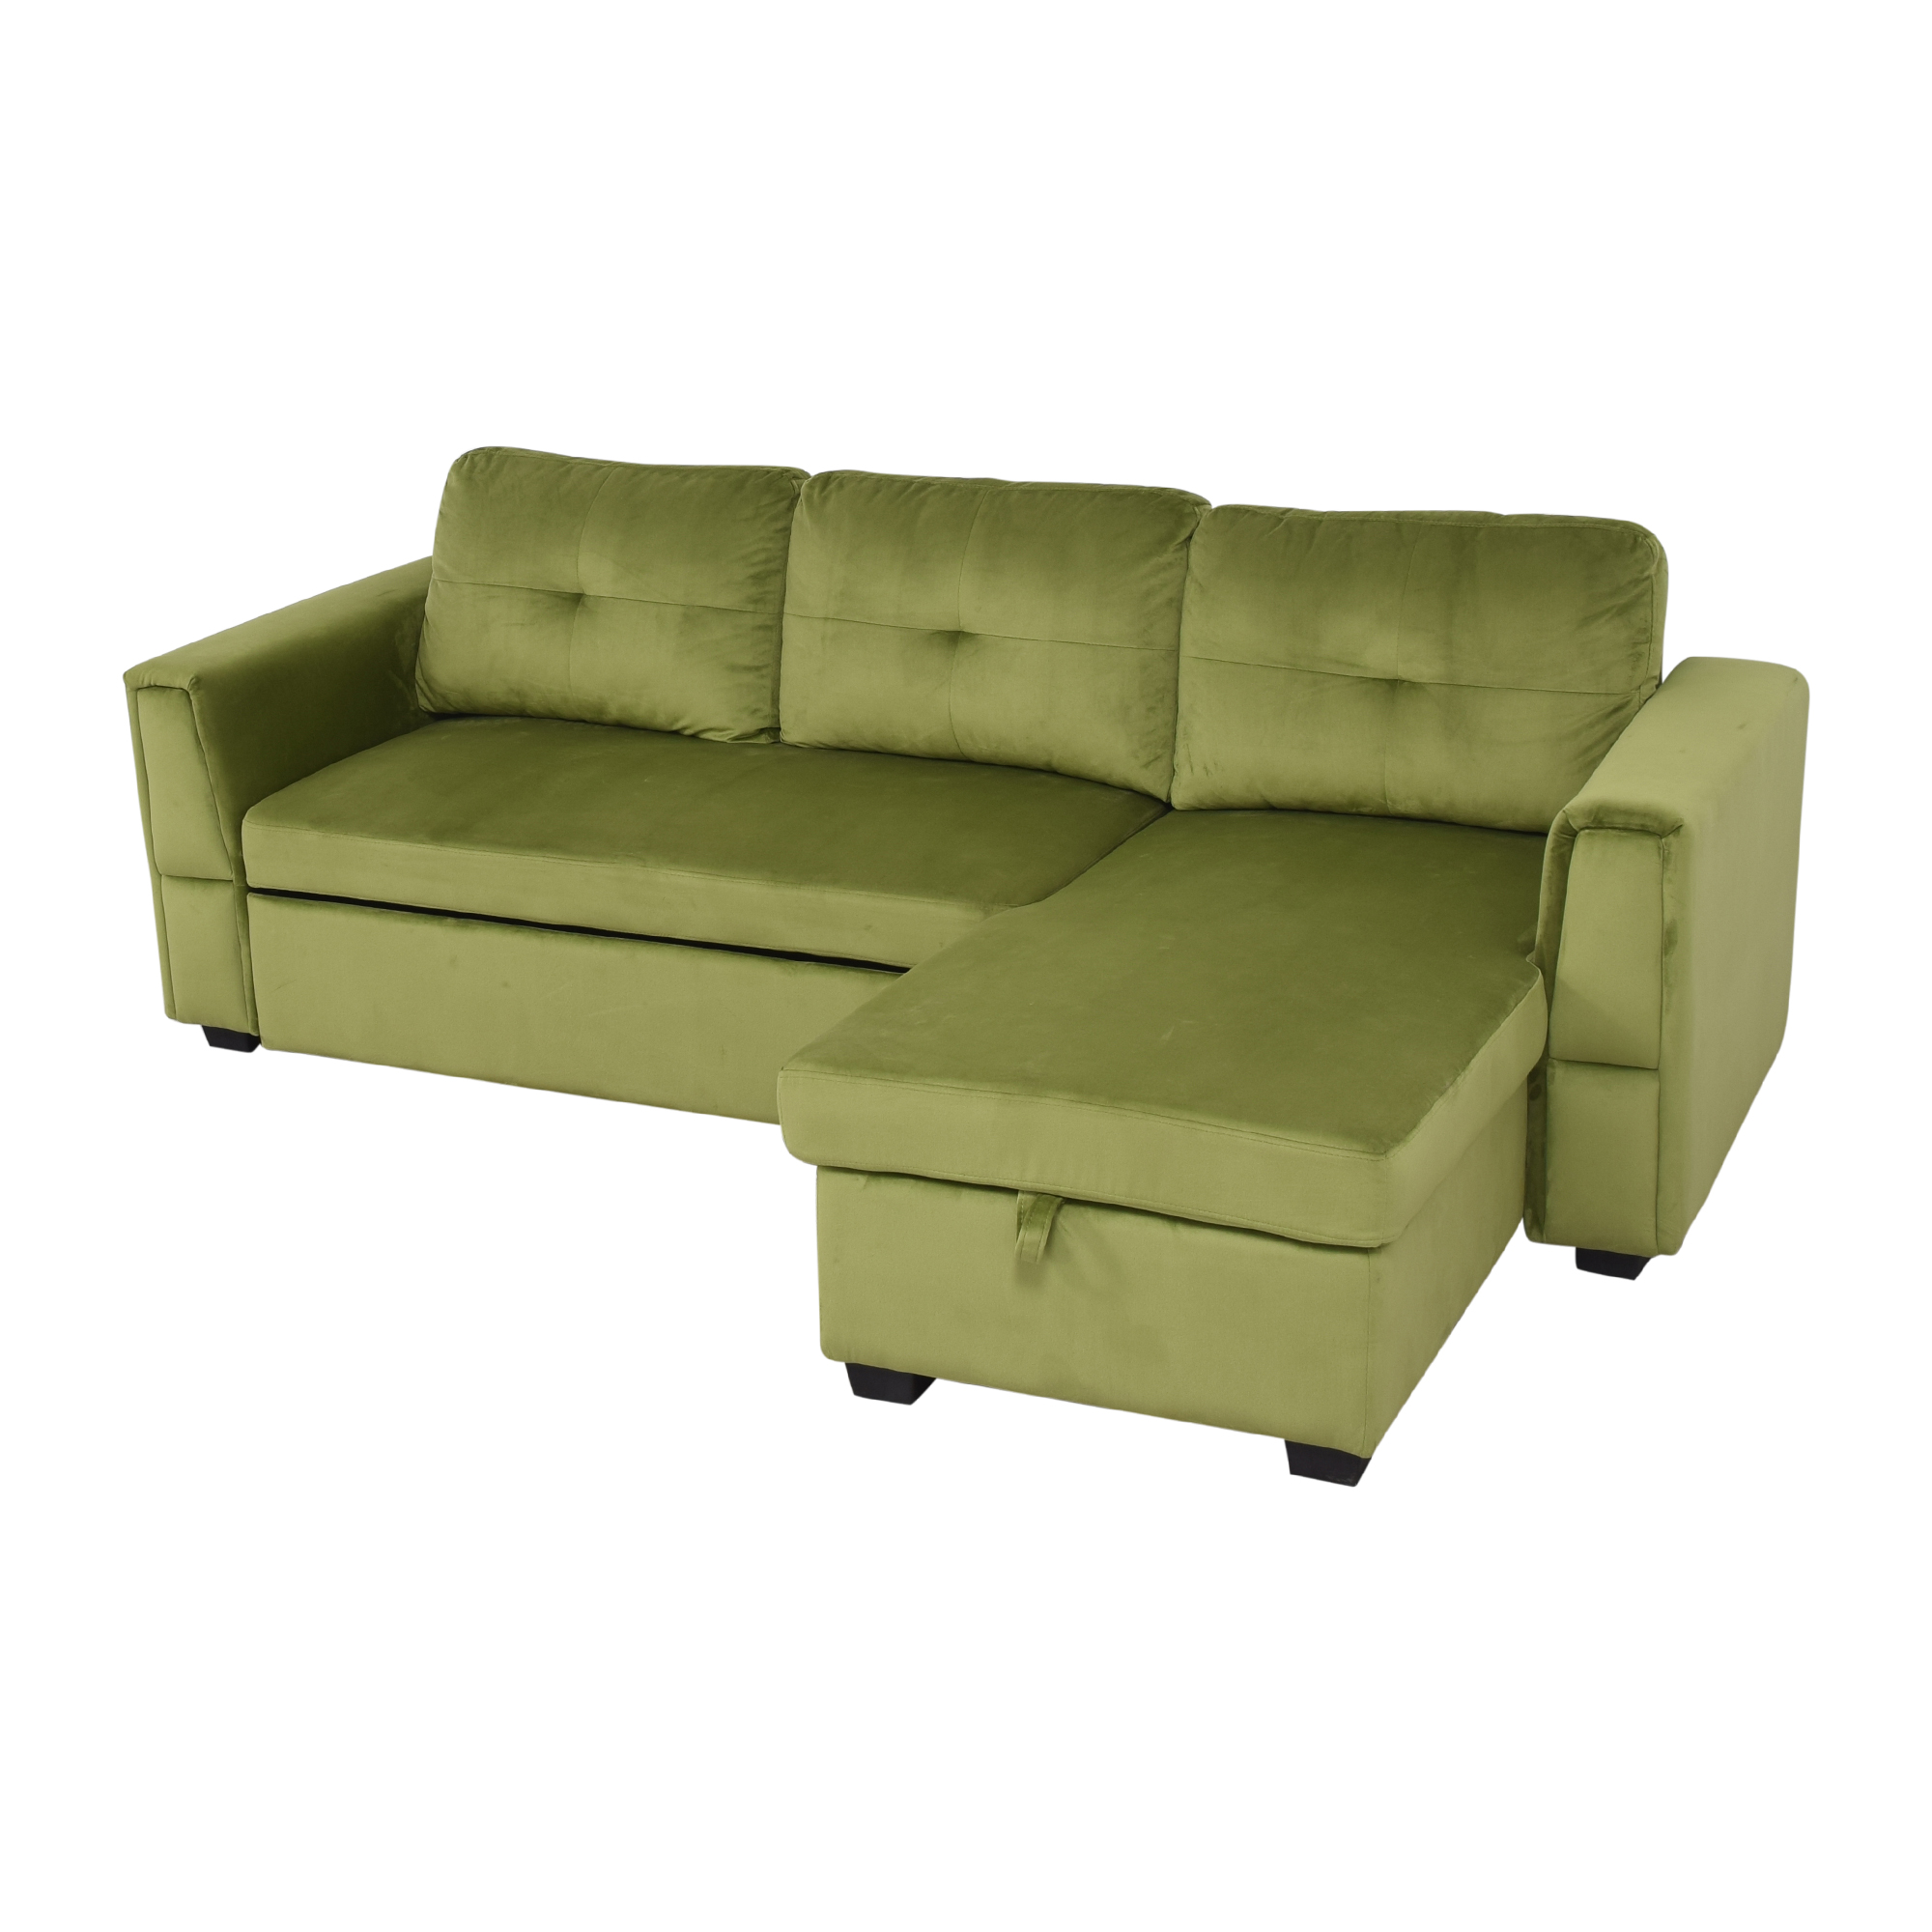 Wayfair Mercer41 Nelda Round Arm Sleeper Sofa Wayfair